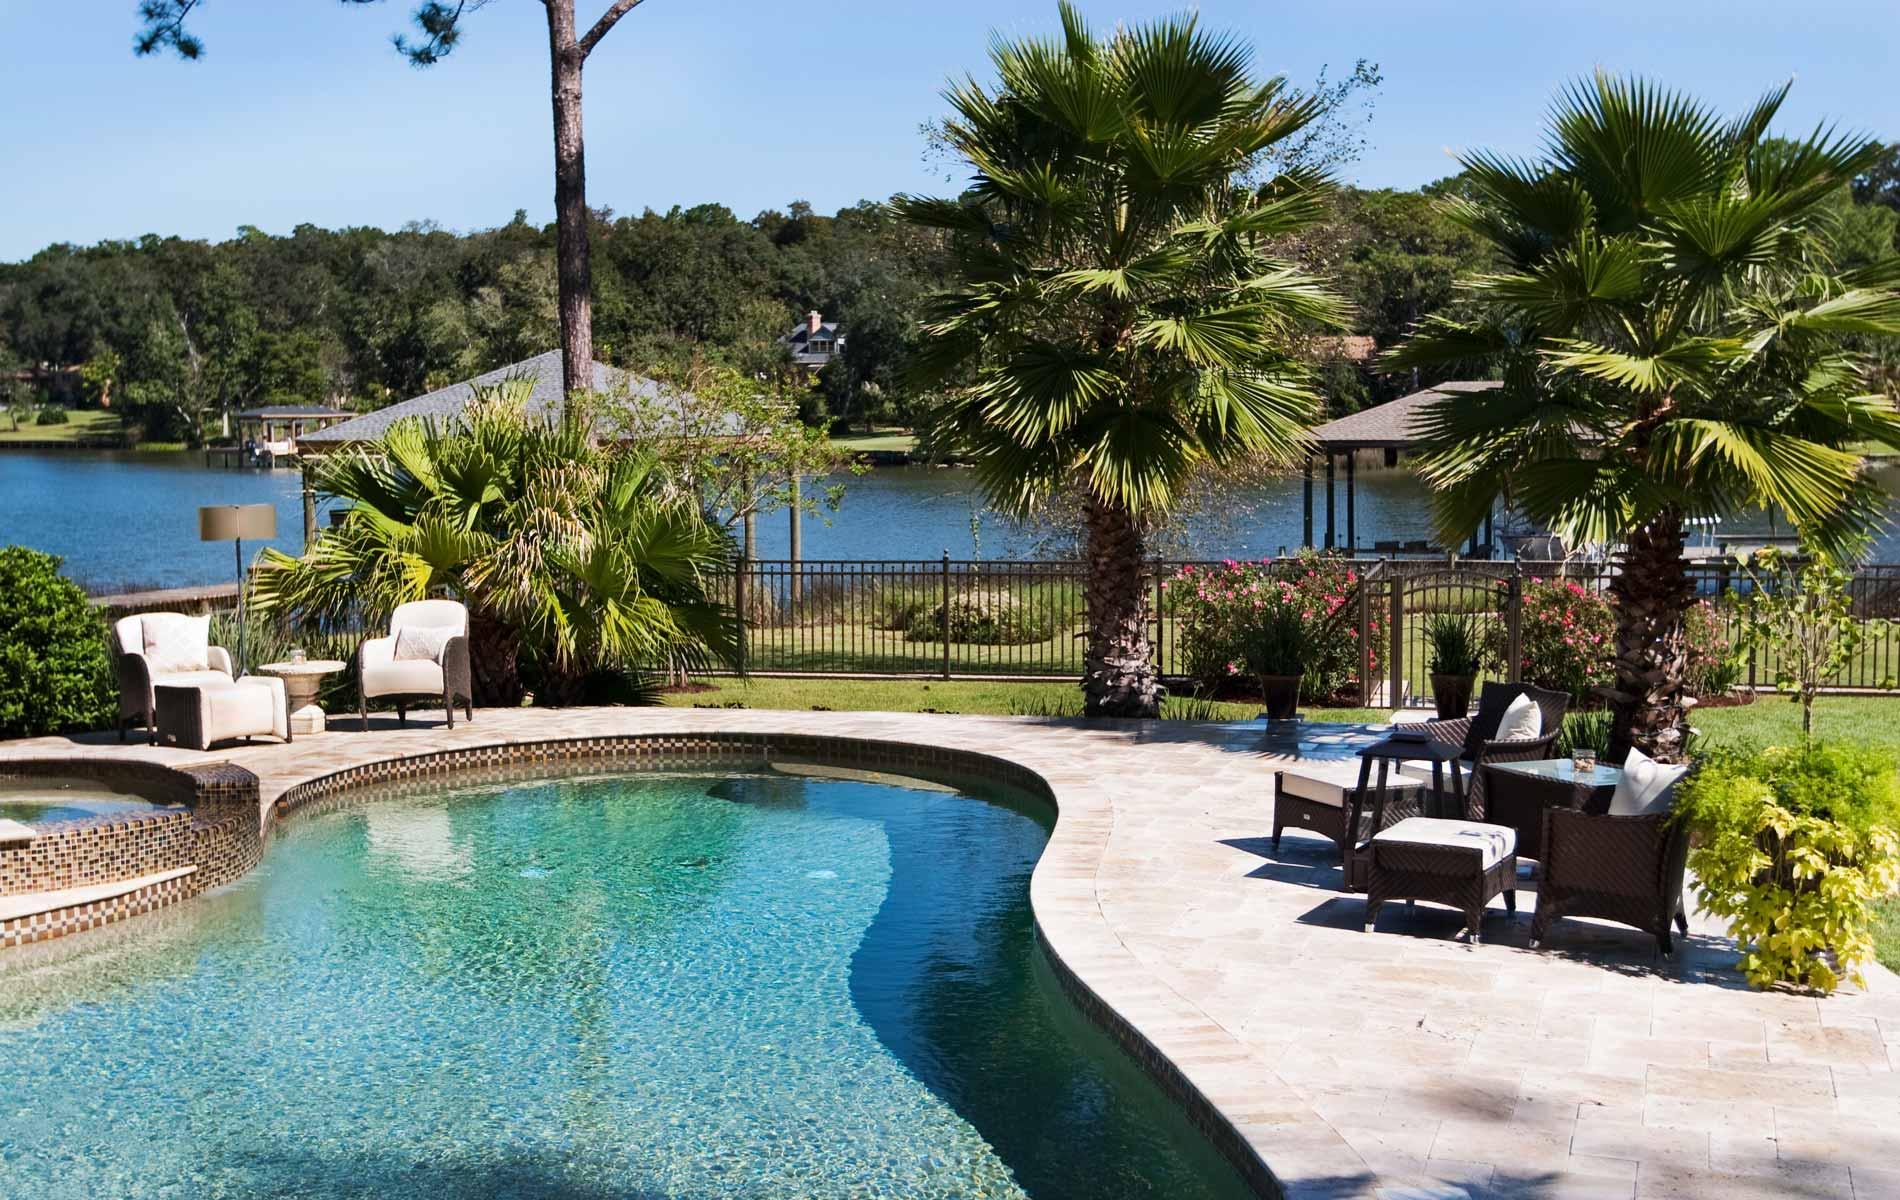 vie-magazine-aqua-pool-patio